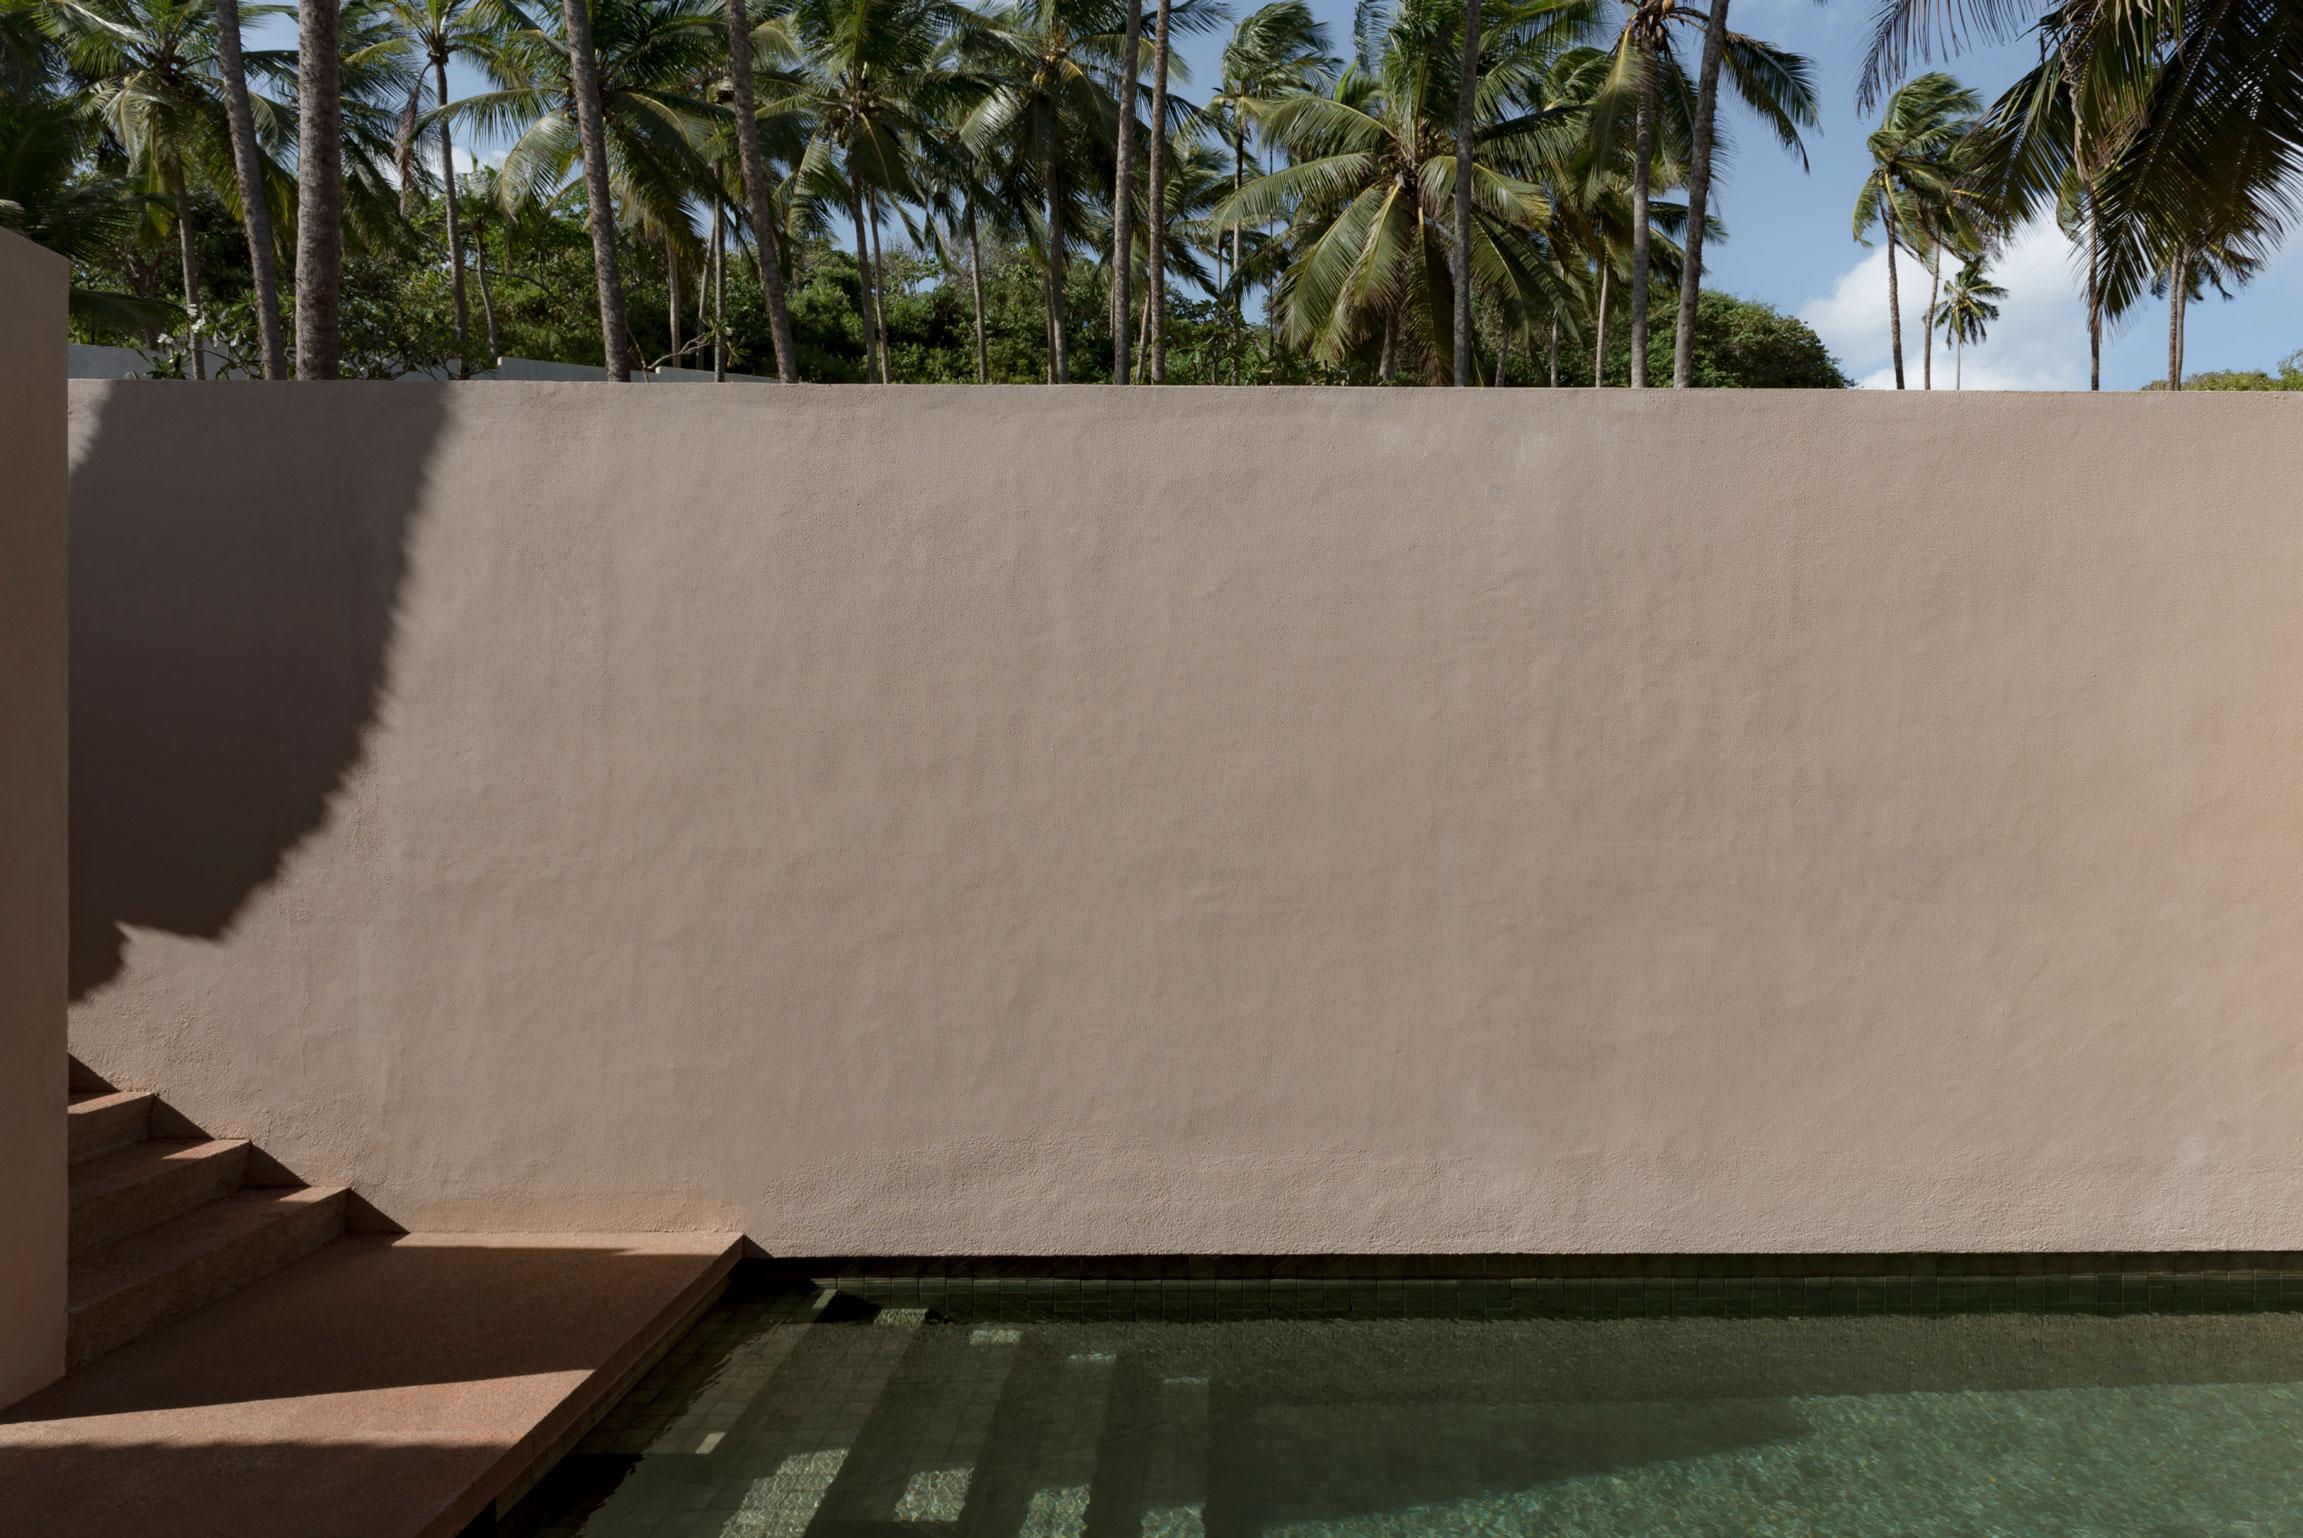 Sri-Lanka-Luxus-hotels-AMANWELLA-Sri-Lanka-Le-Mile-Magazine-review-culture-vulture-LE-MILE-17.jpg